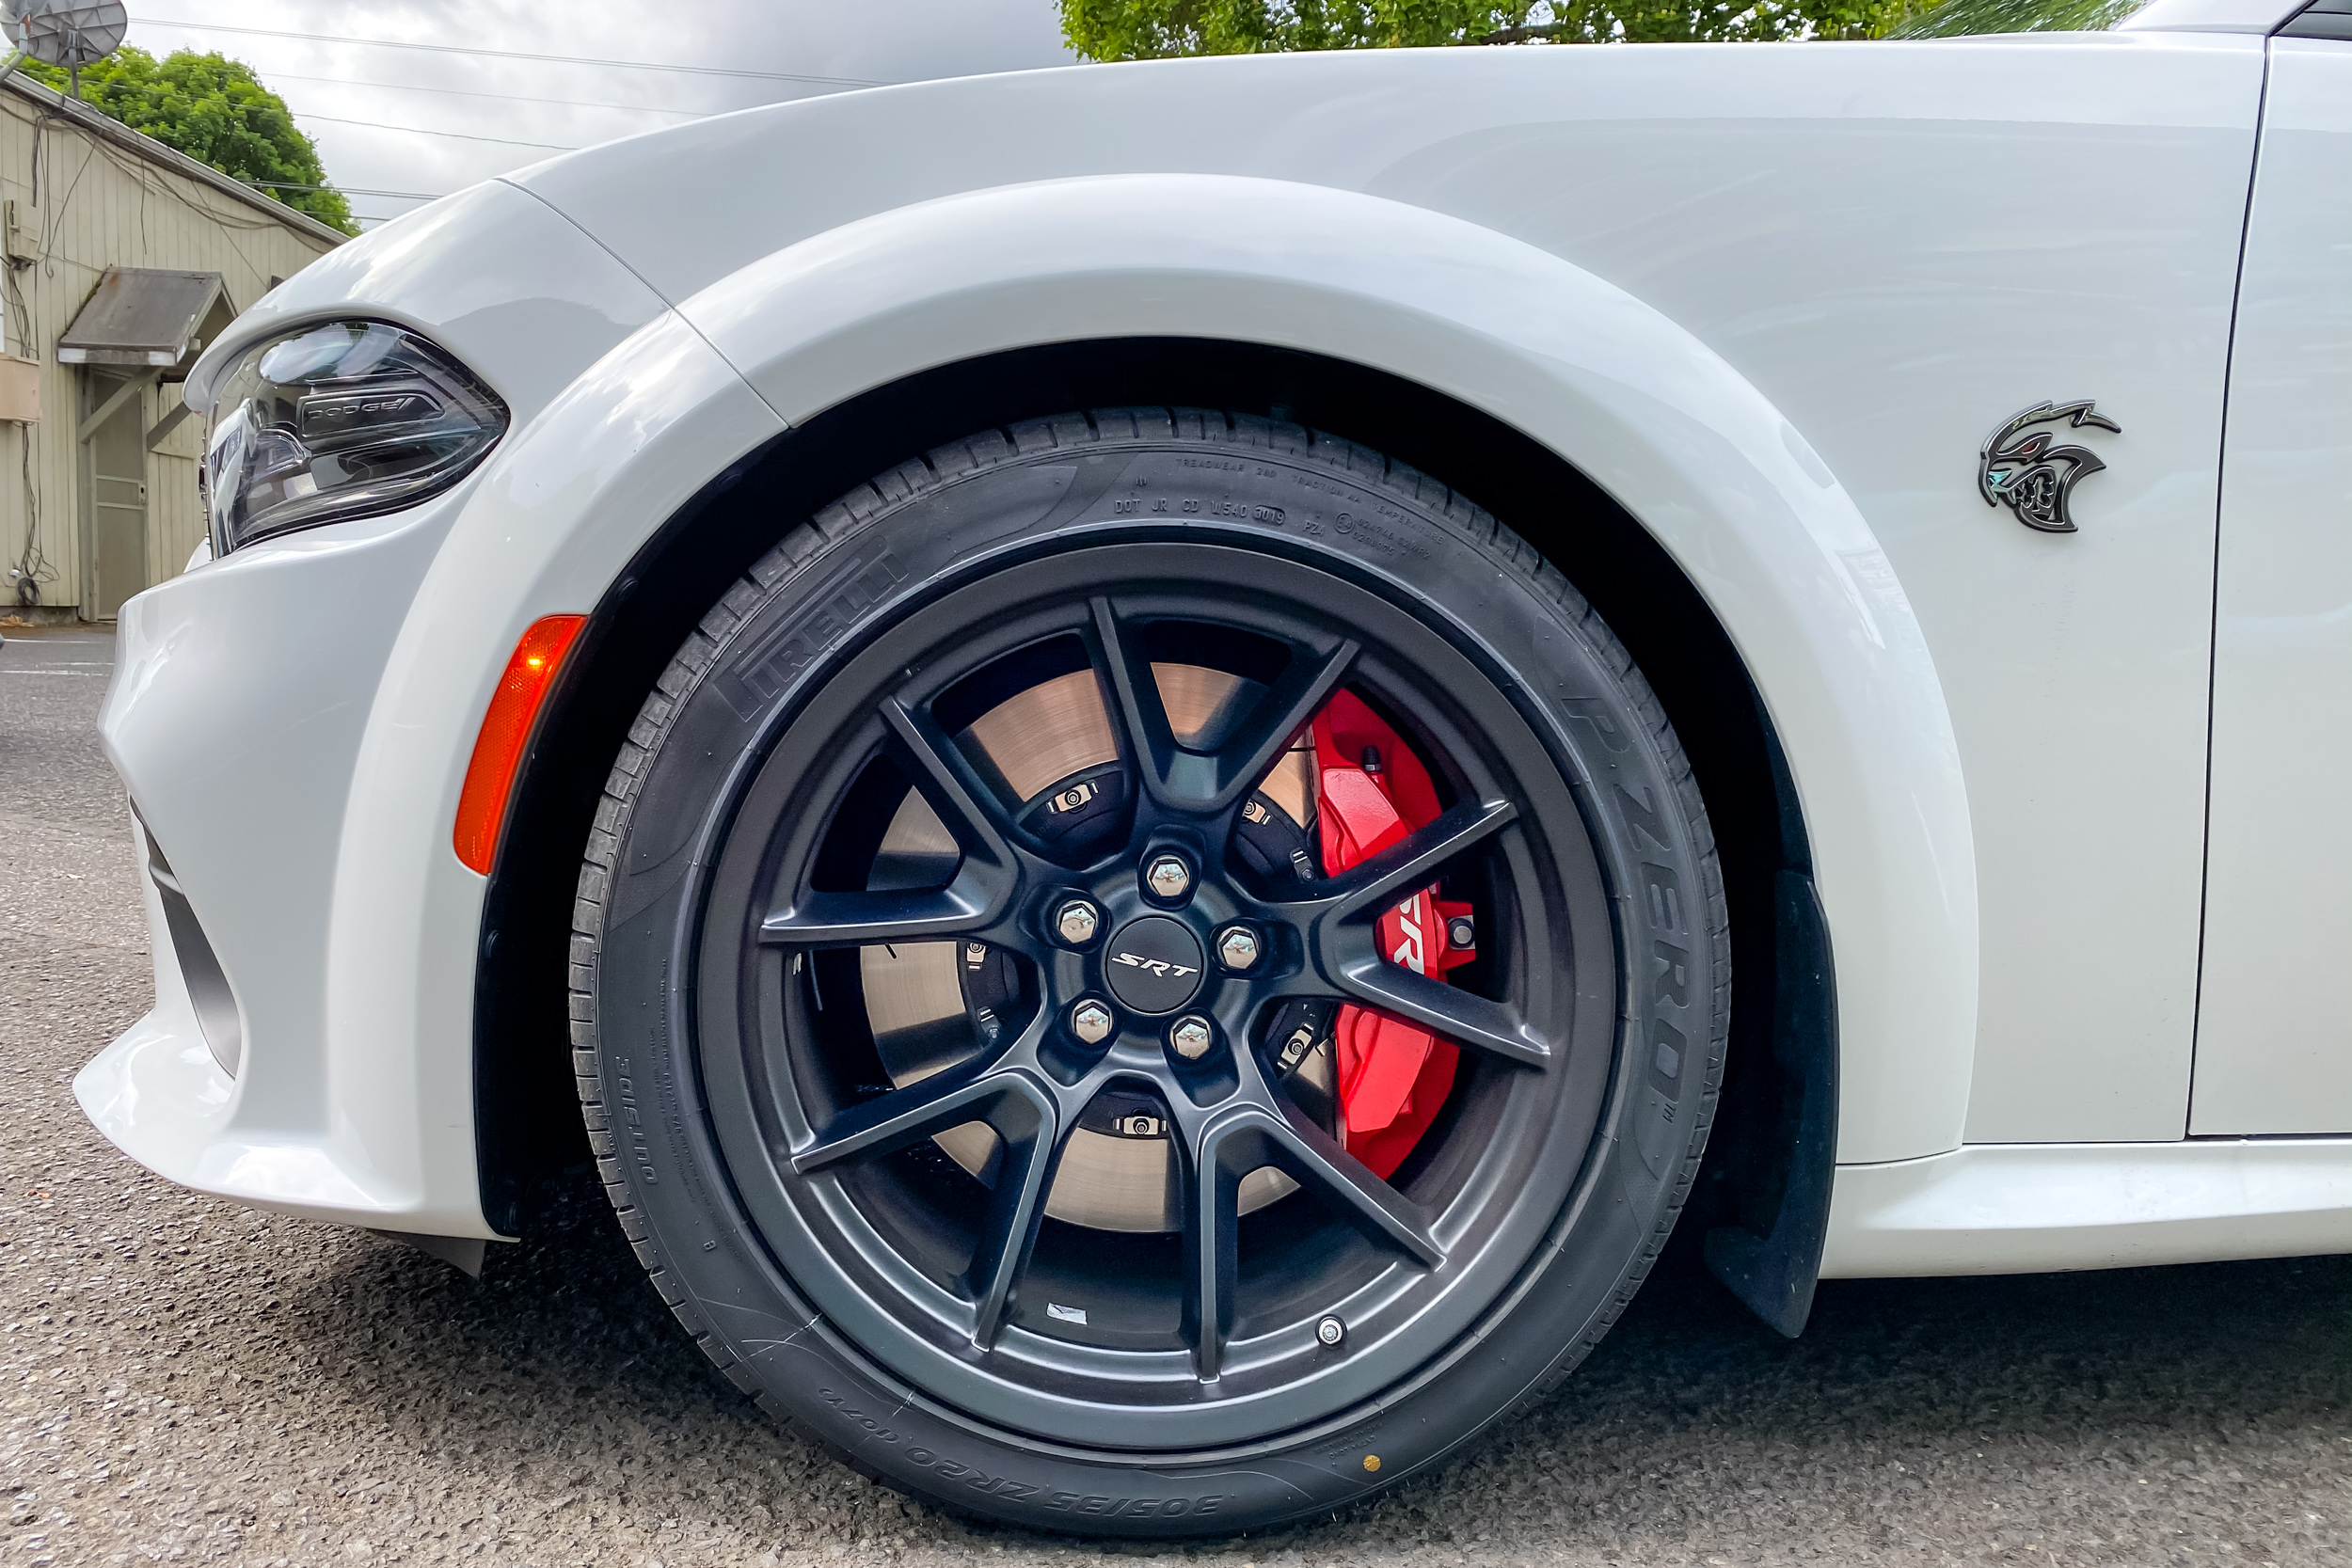 2021 Dodge Charger SRT Hellcat Redeye Widebody front wheel